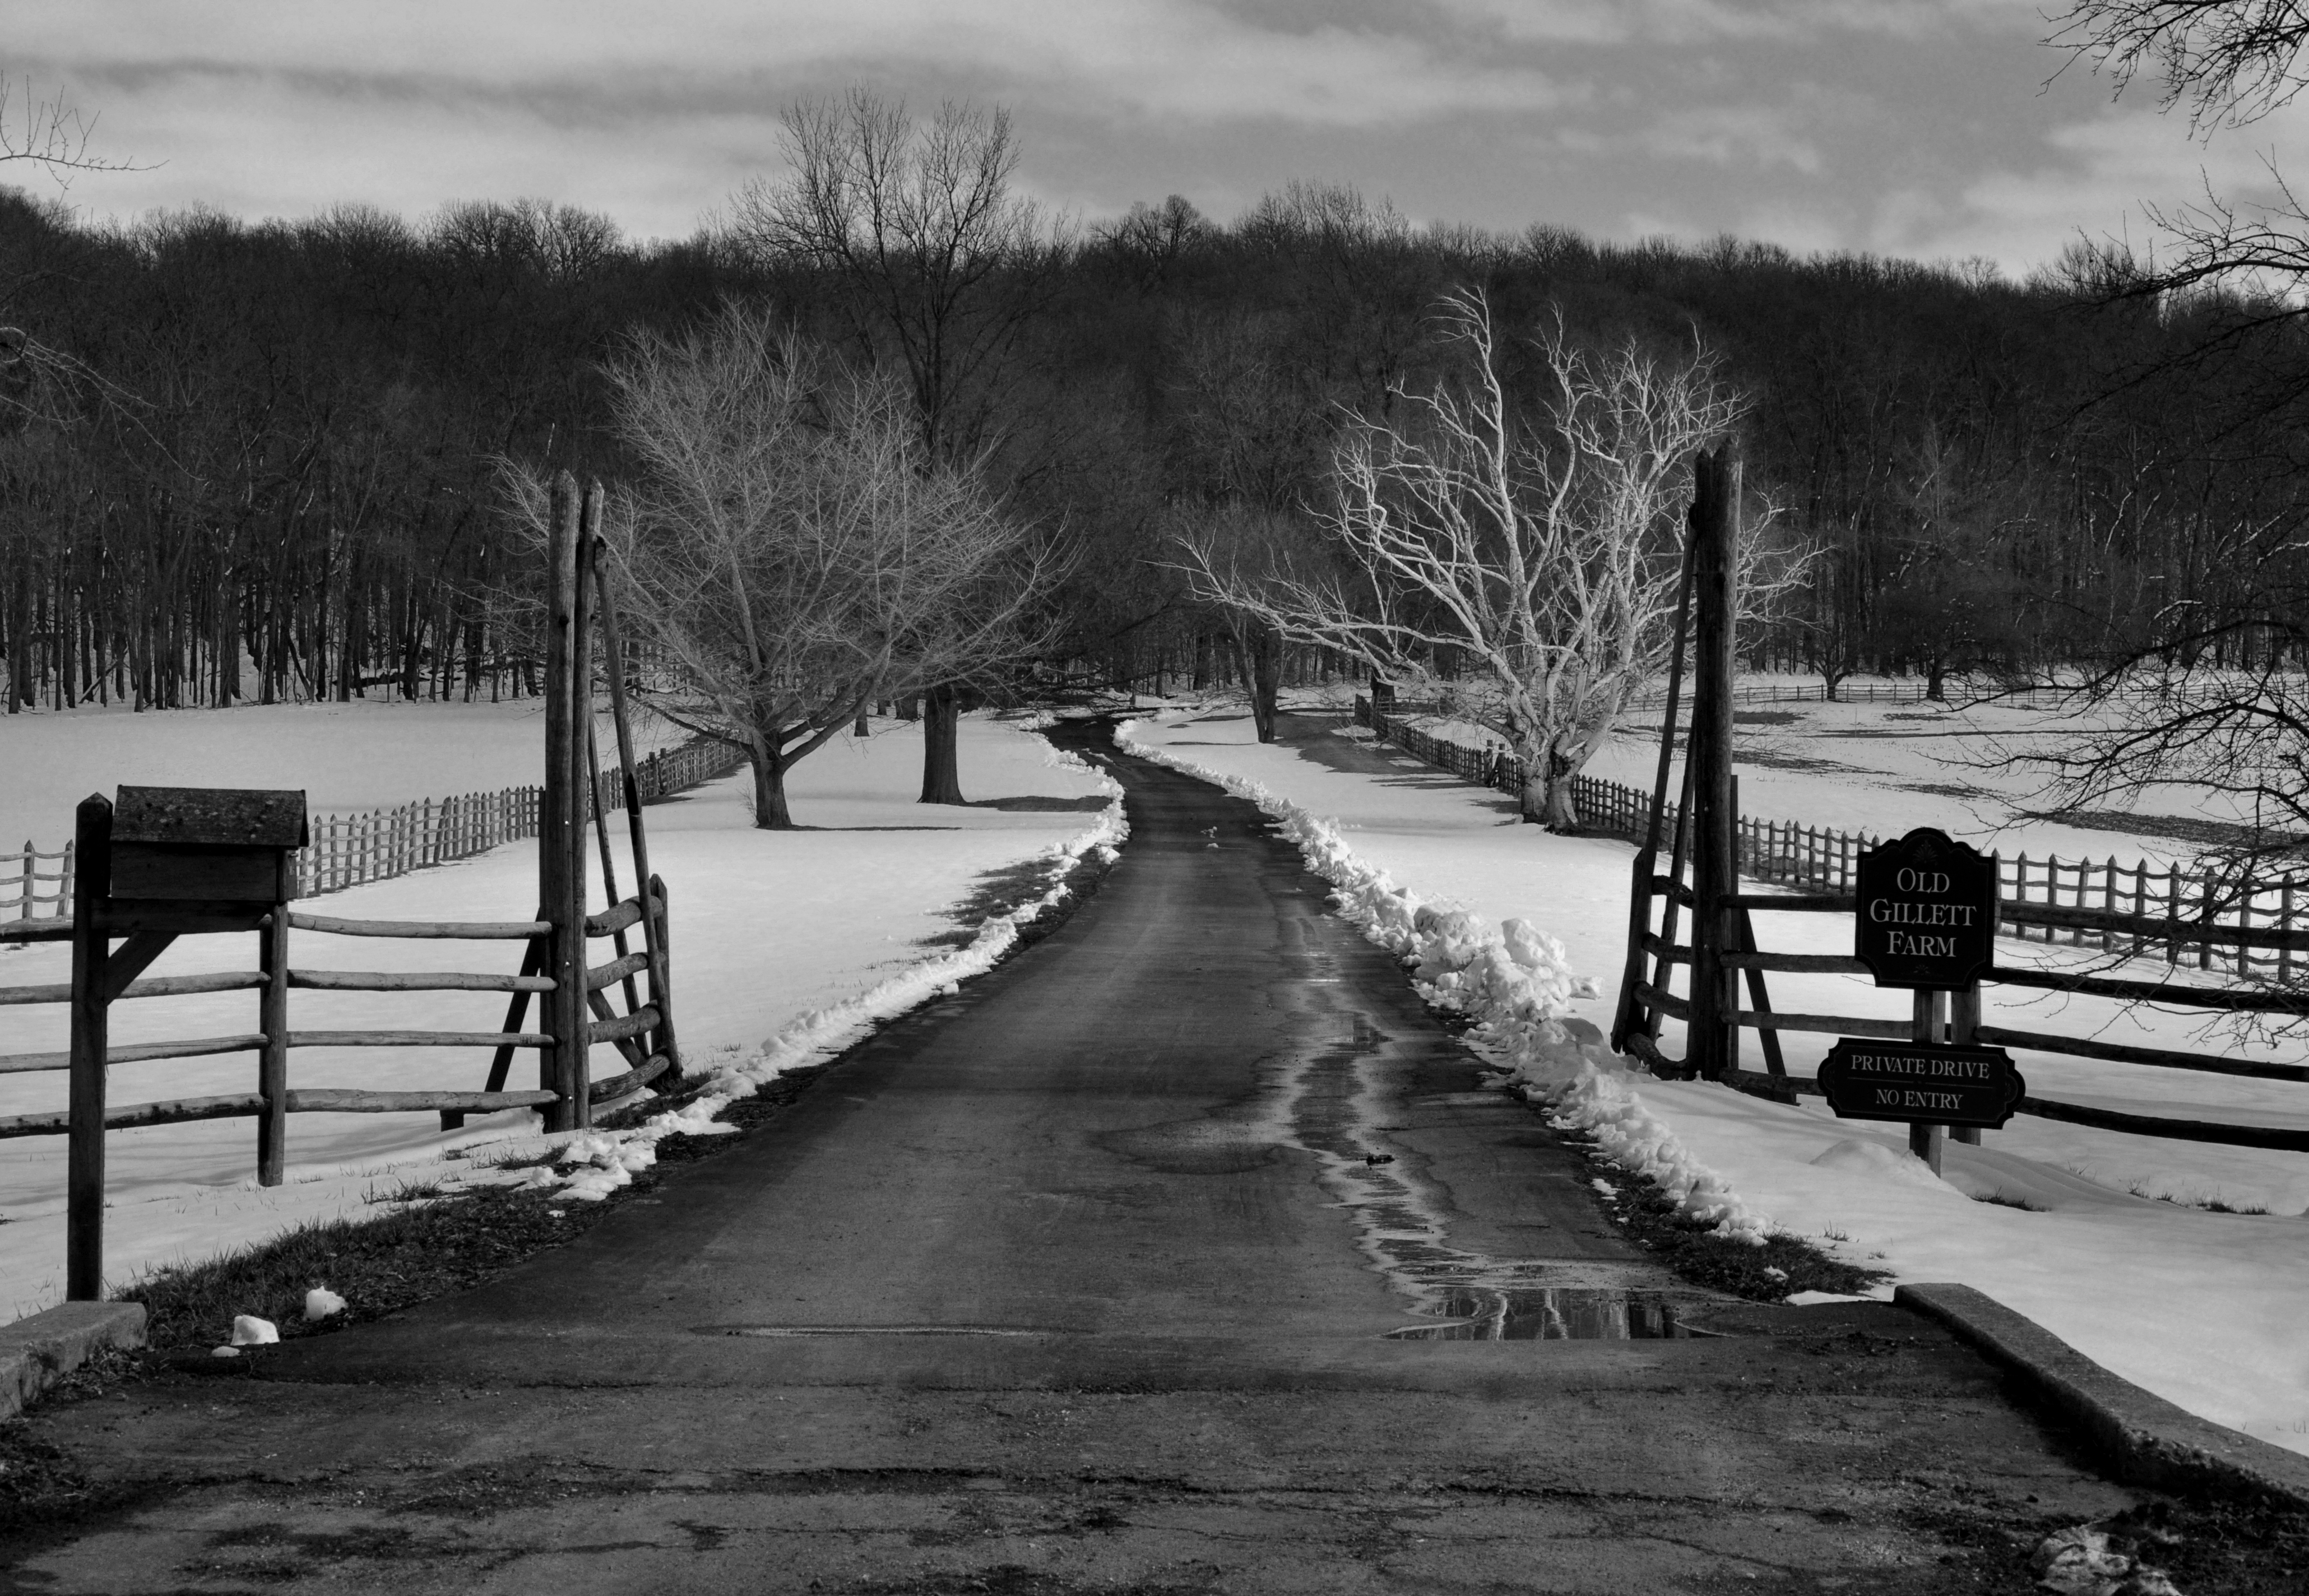 Gillet Farm